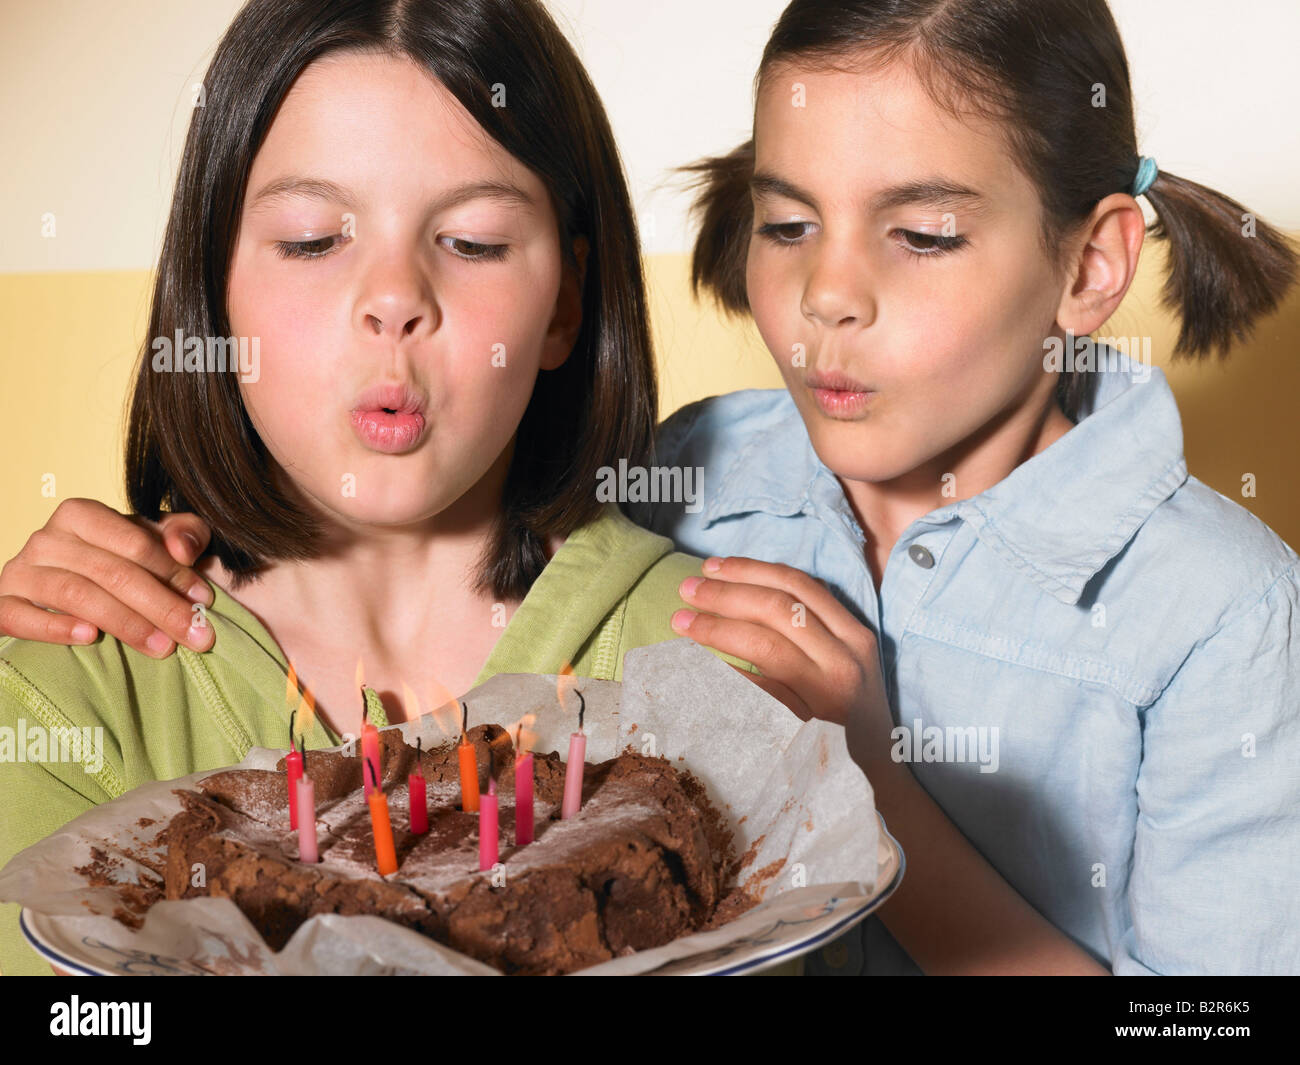 Girls holding a birthday cake - Stock Image